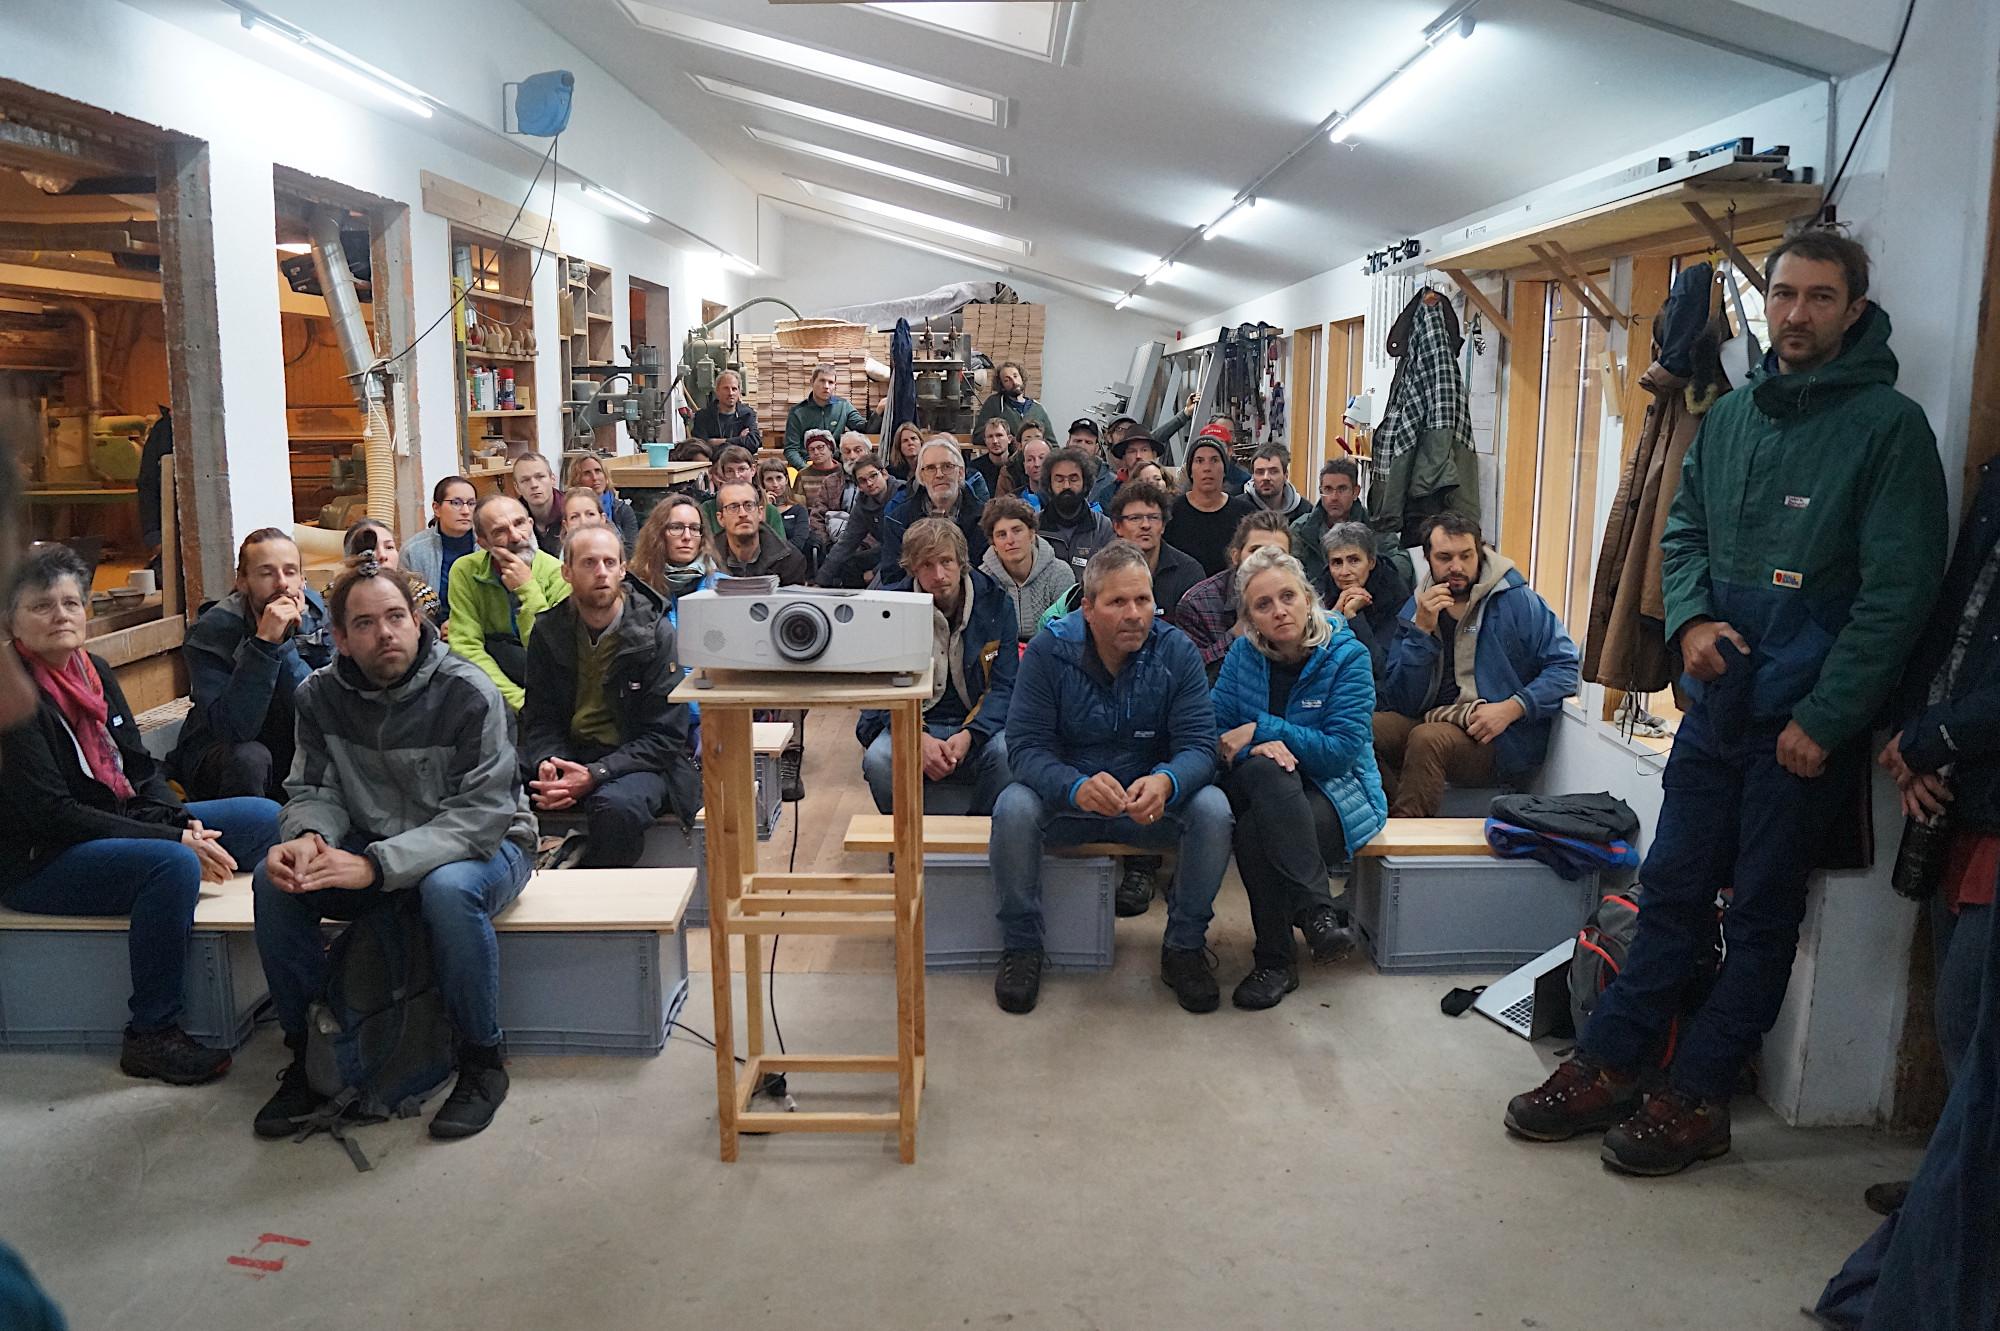 Seminar Hotel Möschberg